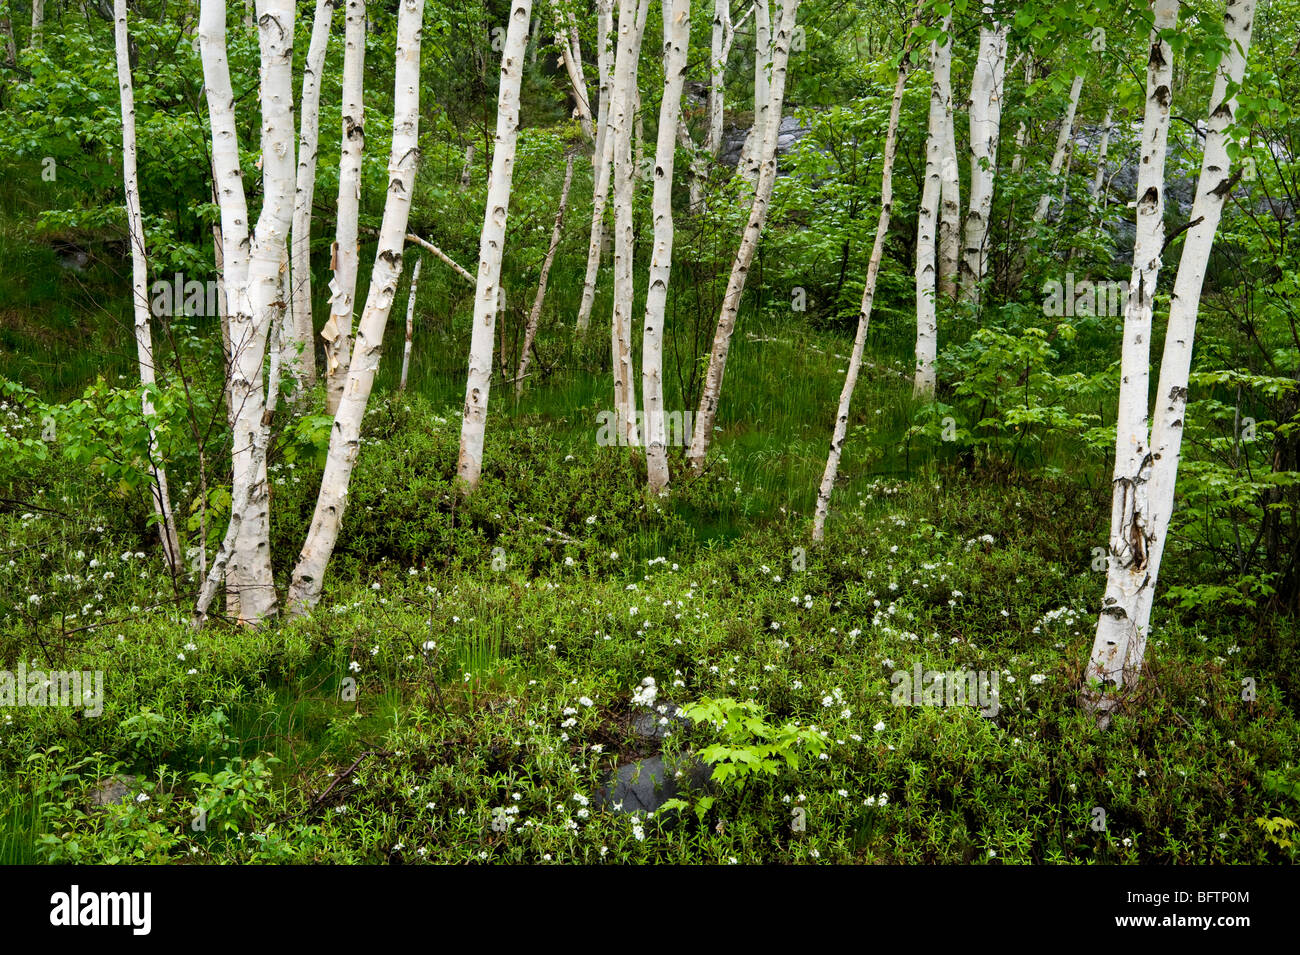 Grove of white birch trees and flowering Labrador tea in spring, Greater Sudbury, Ontario, Canada - Stock Image